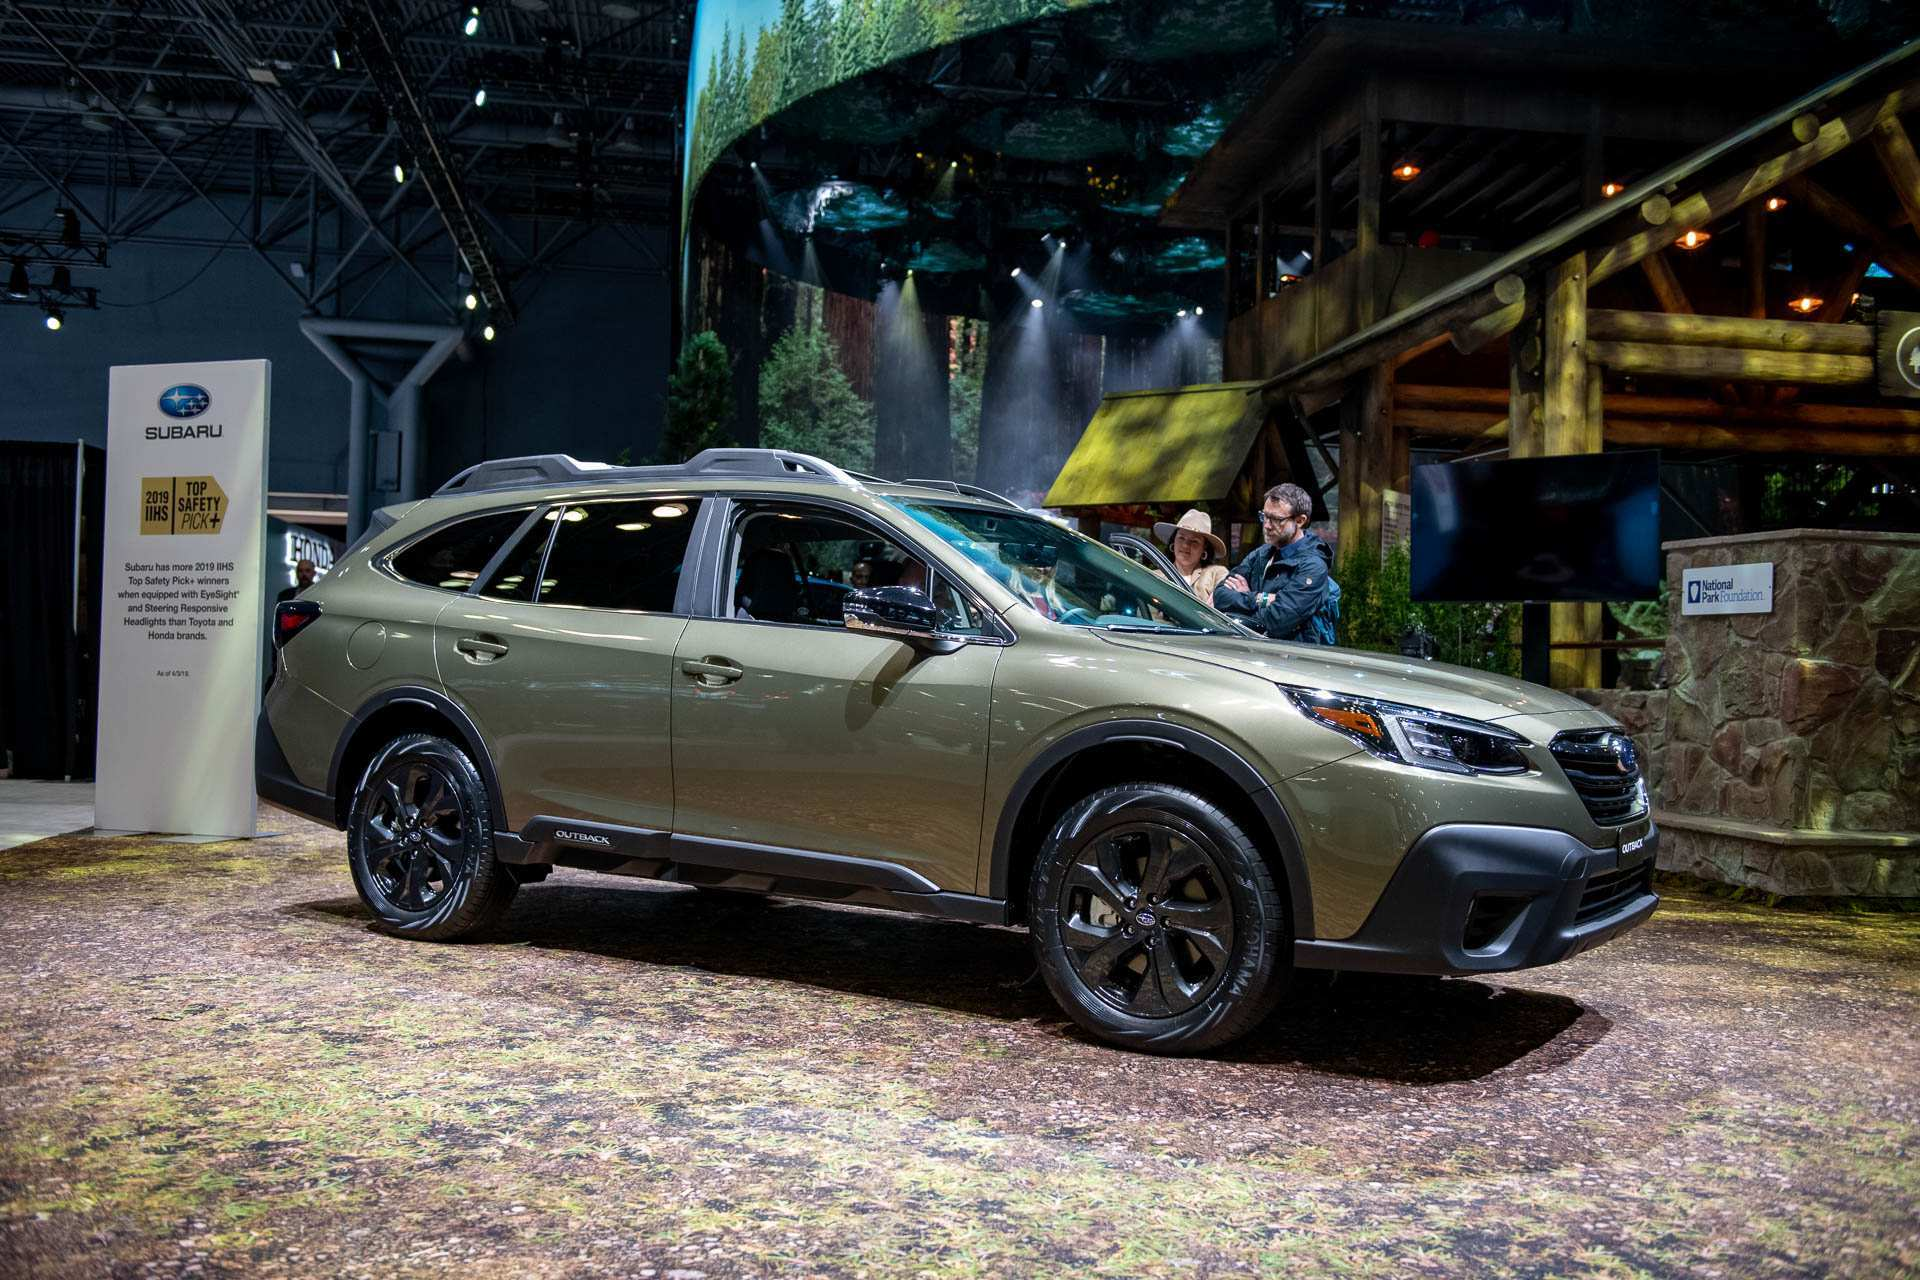 21 The Subaru Outback 2020 Price Rumors for Subaru Outback 2020 Price